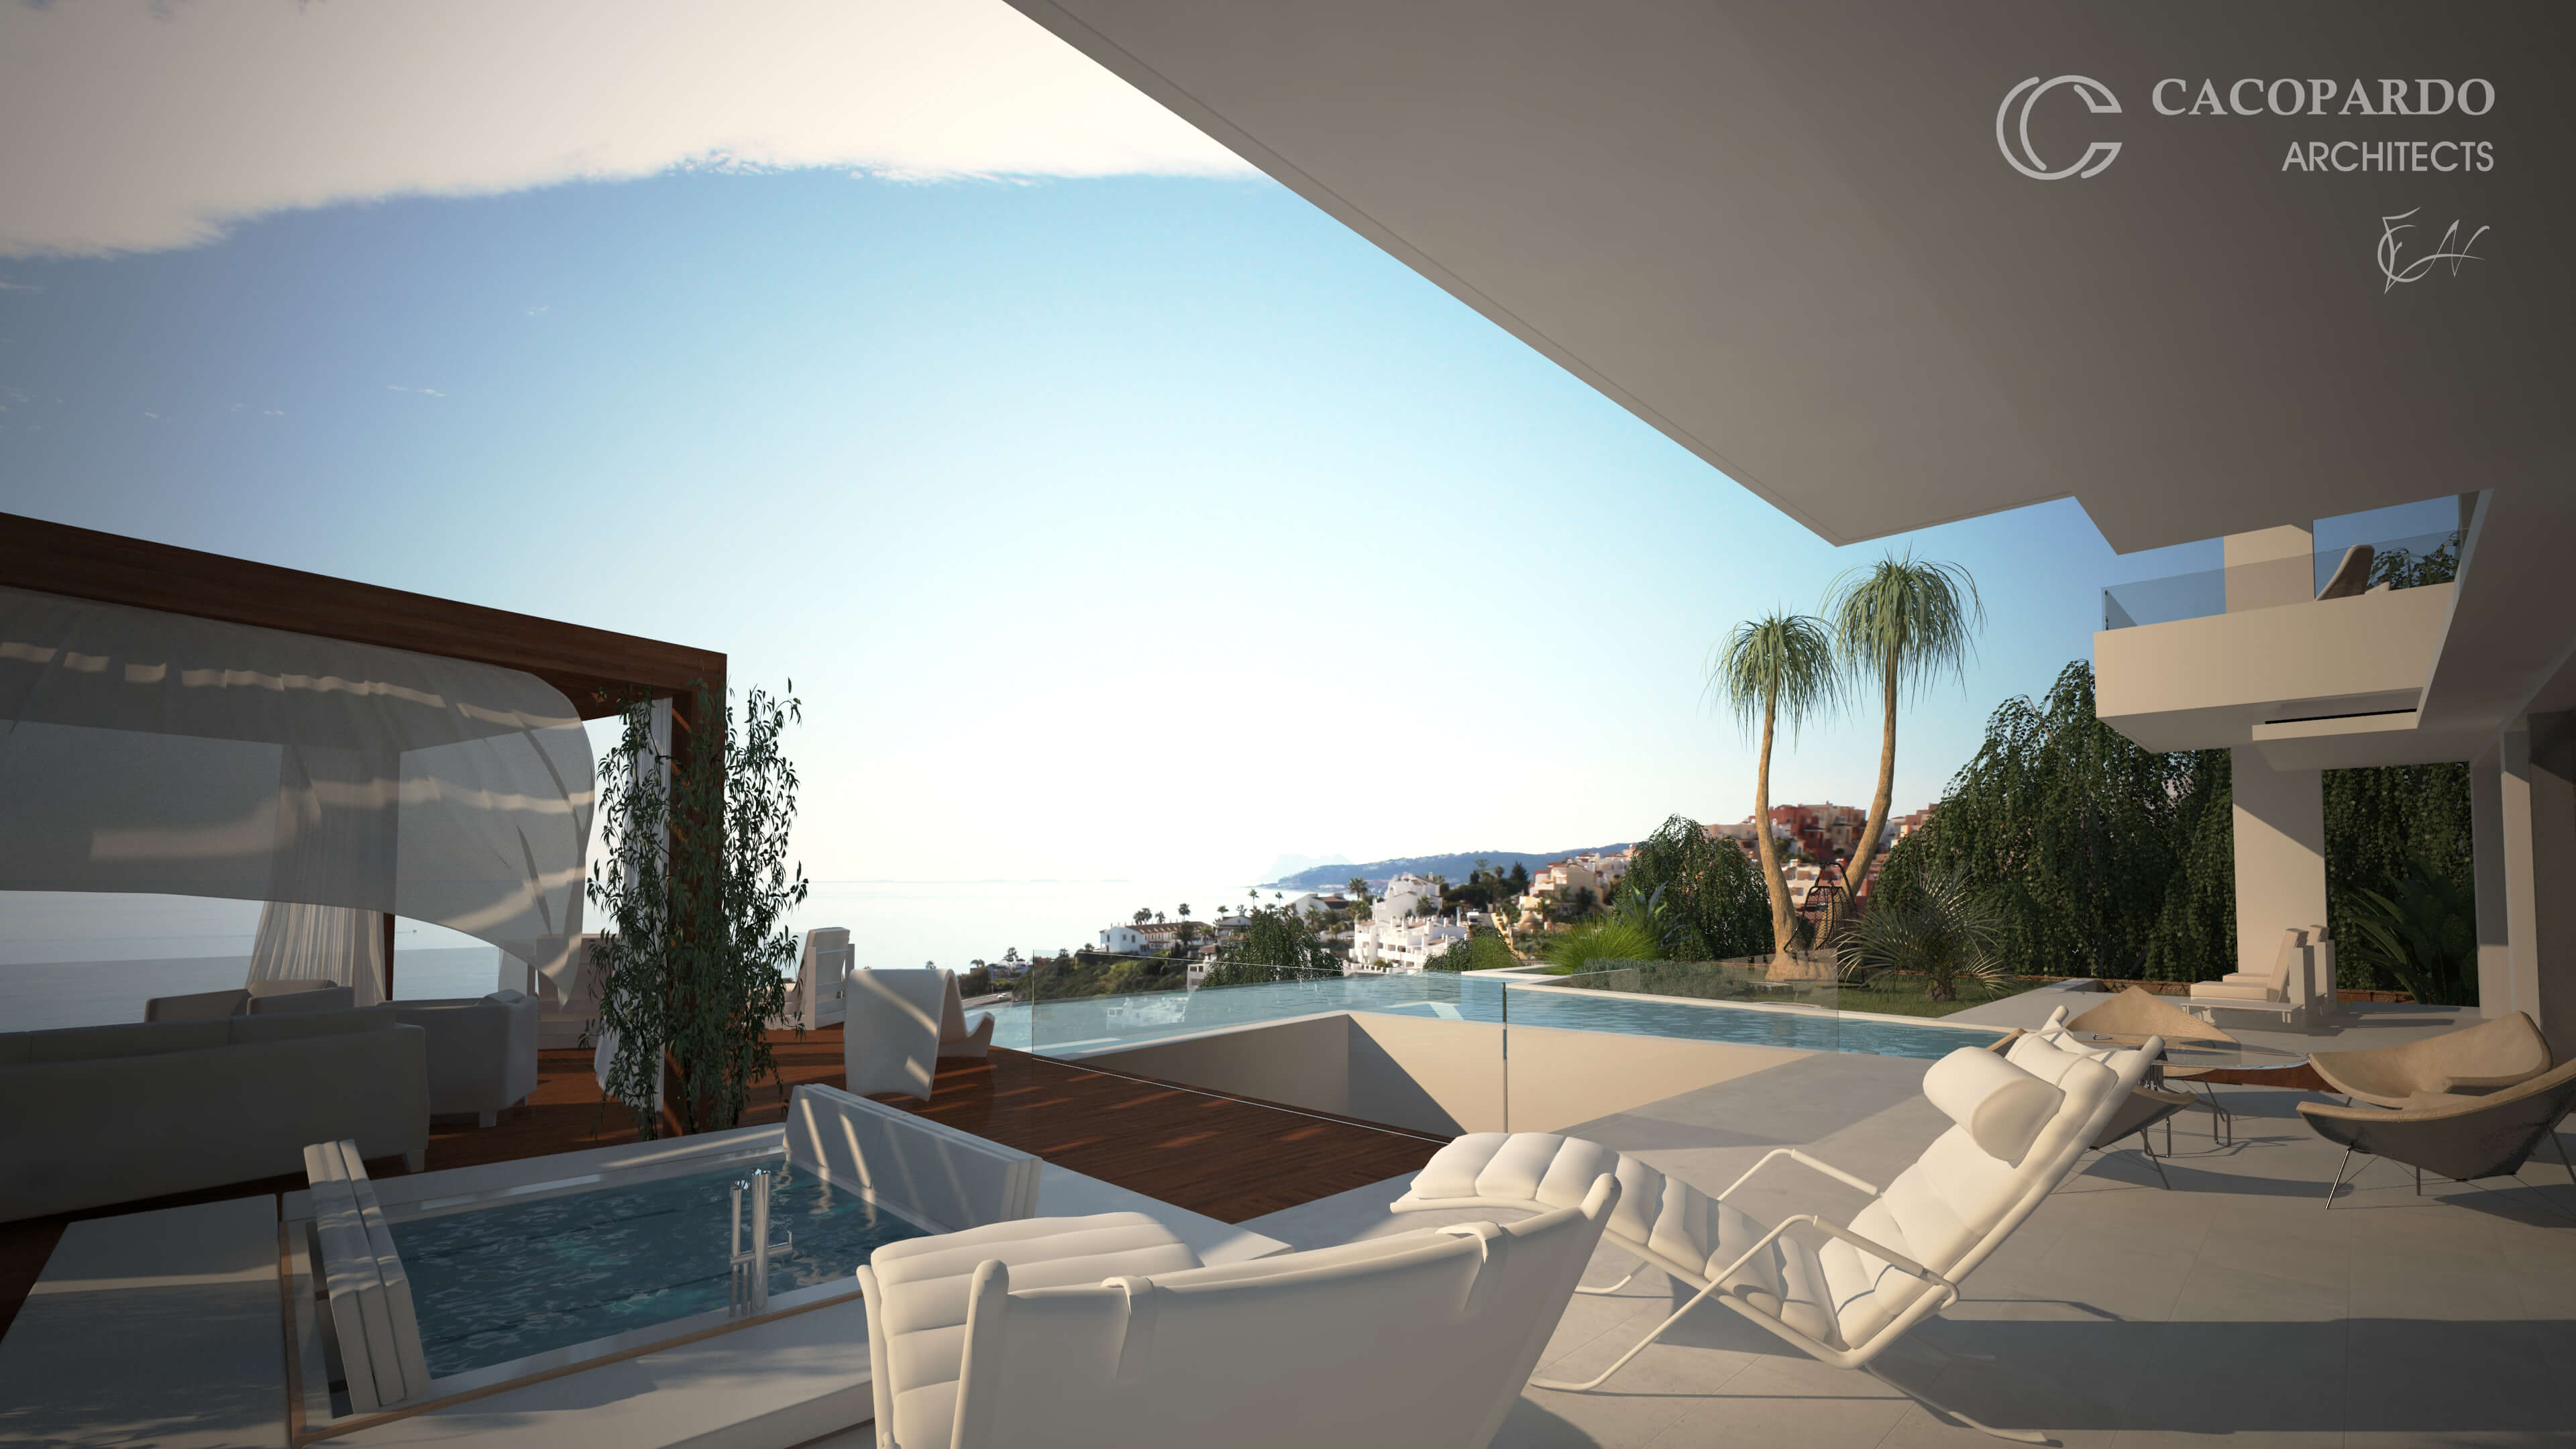 Vista desde el porche -Infinitum House- Costa del Sol